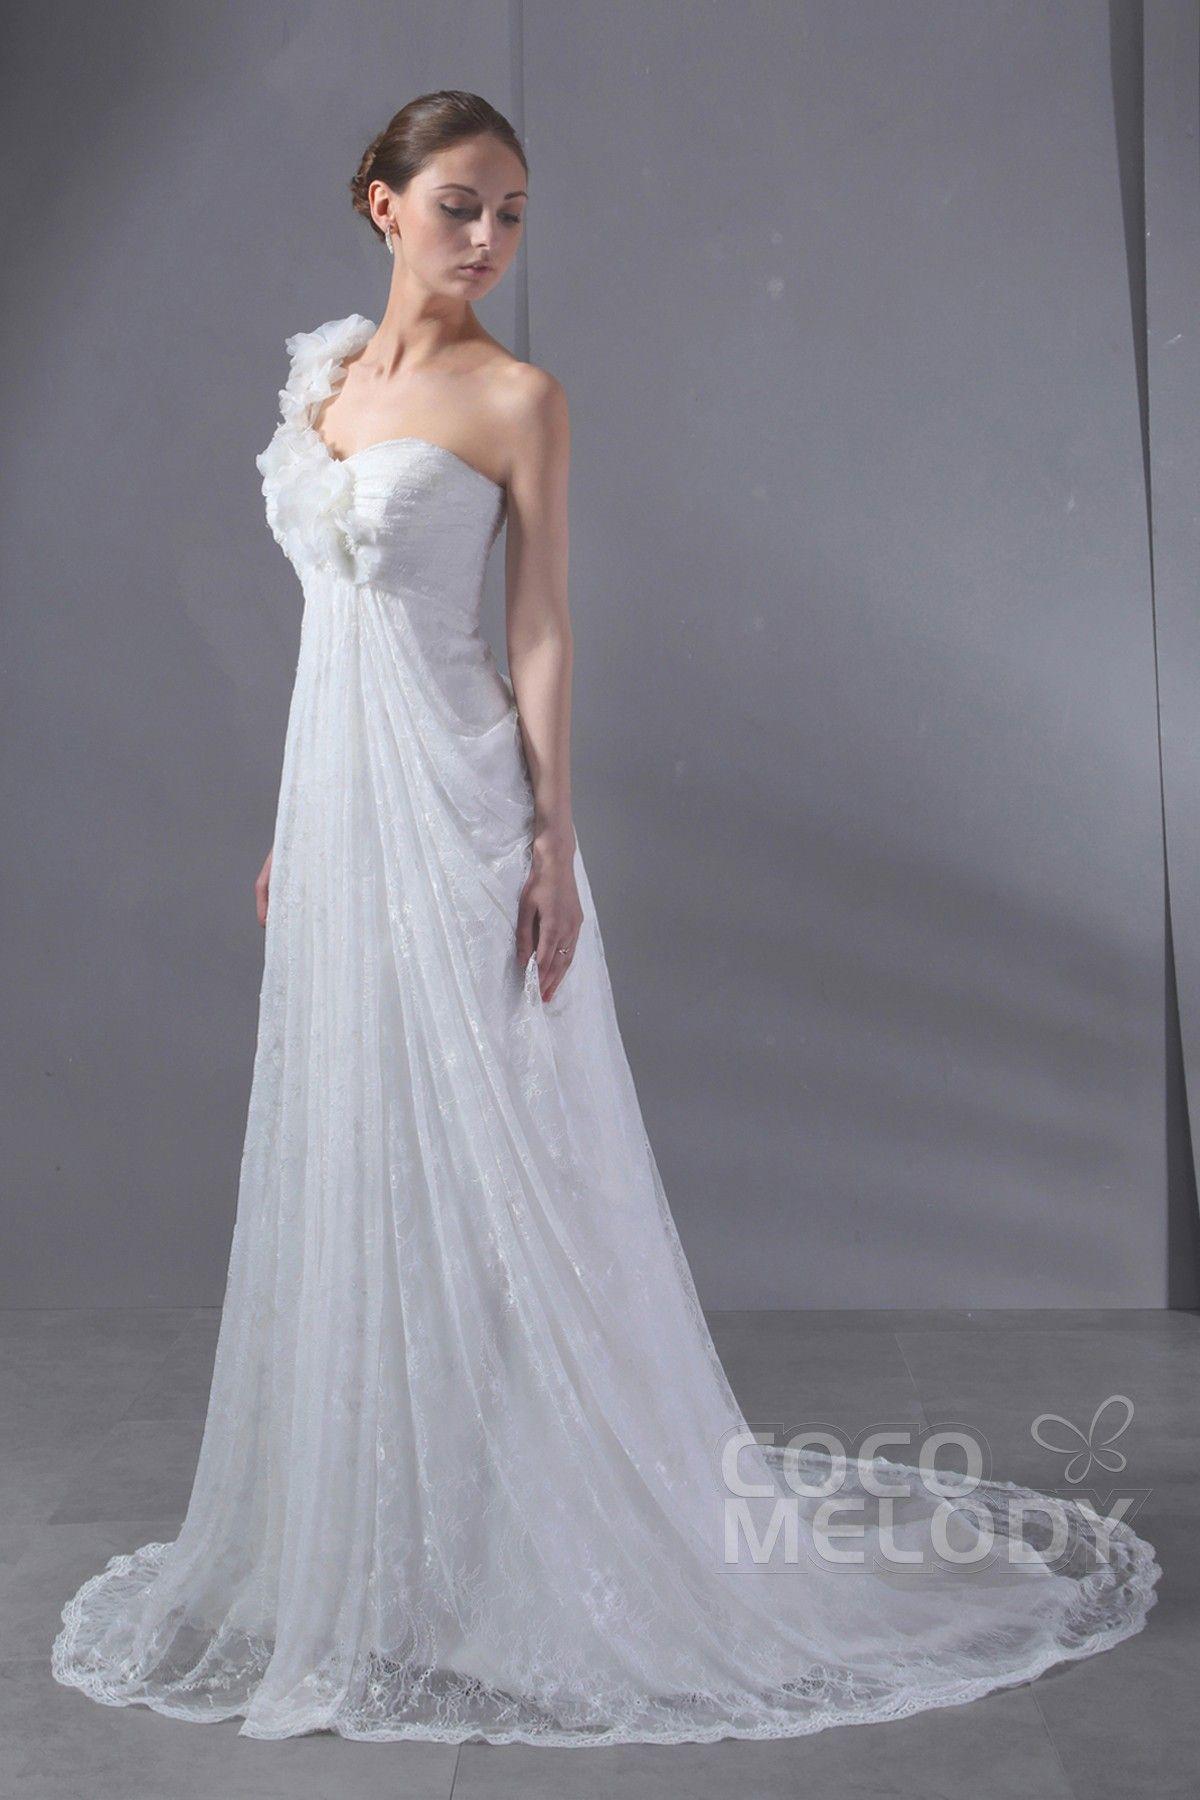 Usd 279 Sheath Column Court Train Lace Wedding Dress Cwlt13058 Wedding Dress Types Empire Wedding Dress Wedding Dresses Lace